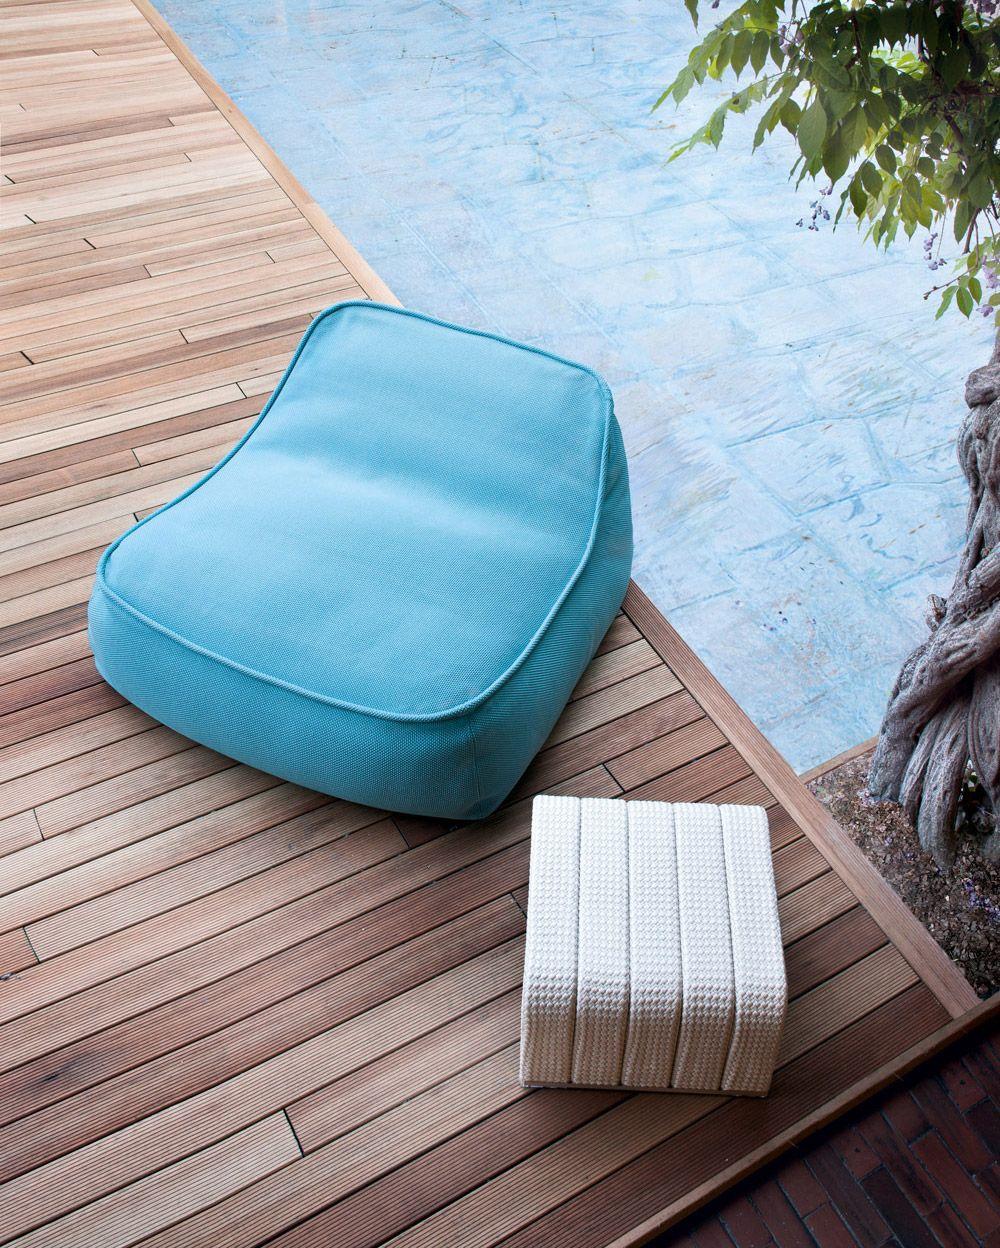 Attirant Paola Lenti Outdoor Pouf Chair   Float   Paola Lenti Dachterrasse, Balkon,  Moderne Lounge